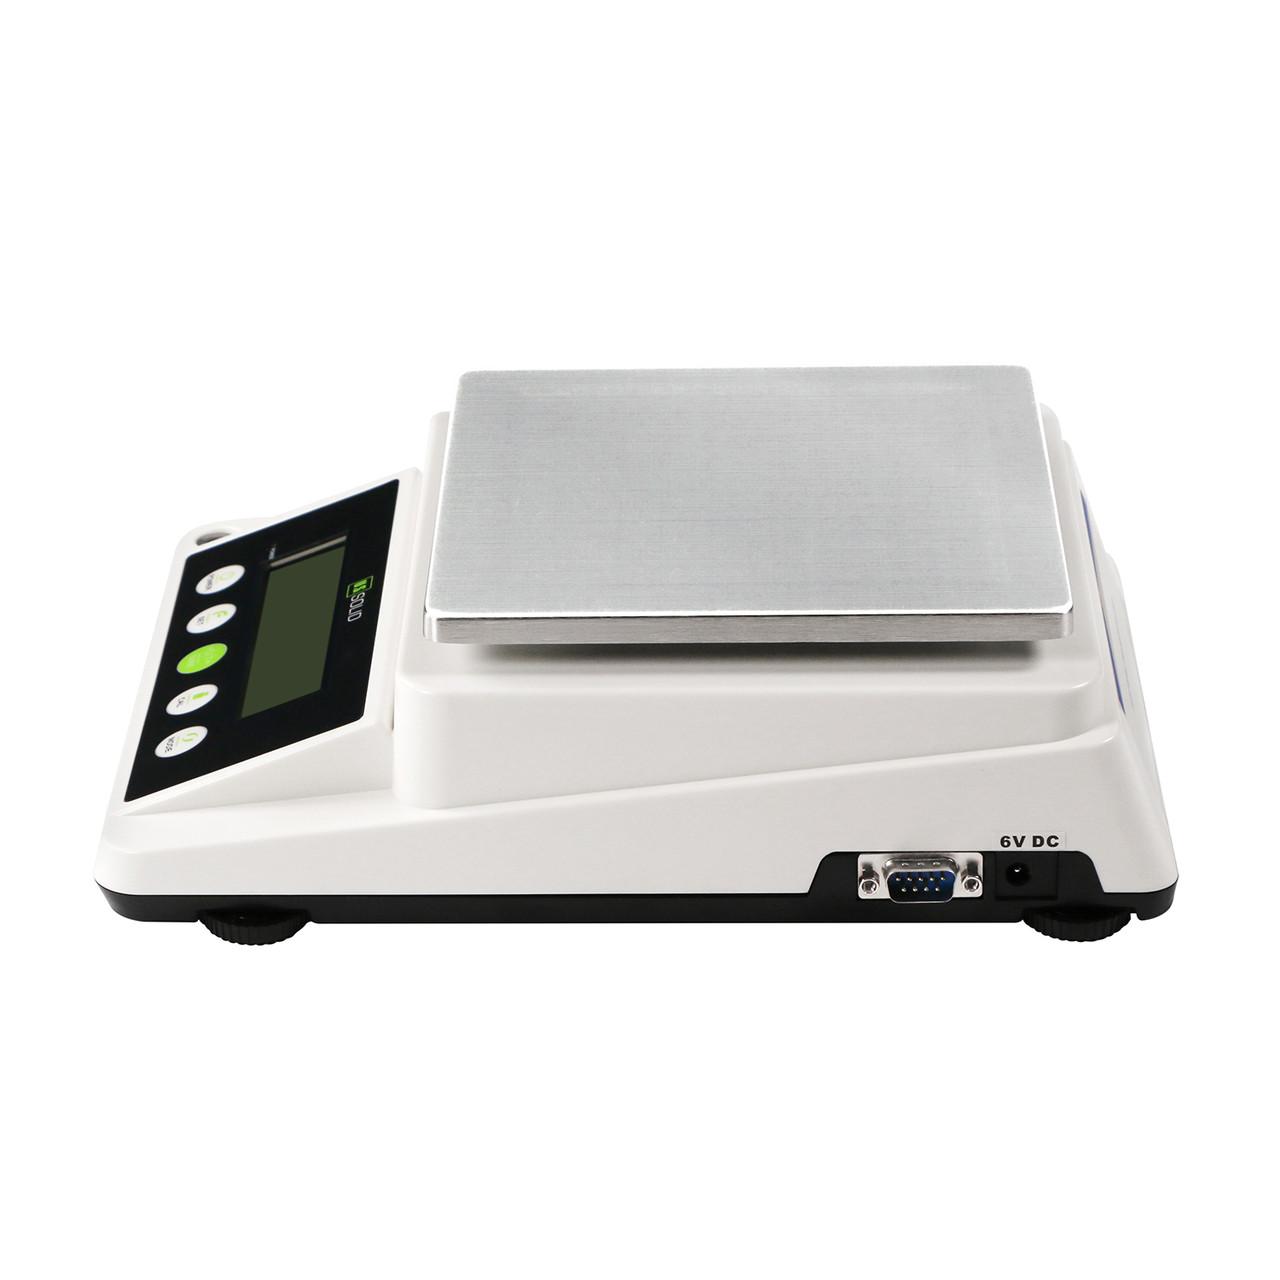 U.S. Solid 0.1 g Precision Balance – 3 kg Digital Analytical Lab Electronic  Scale, 3100 g x 0.1g